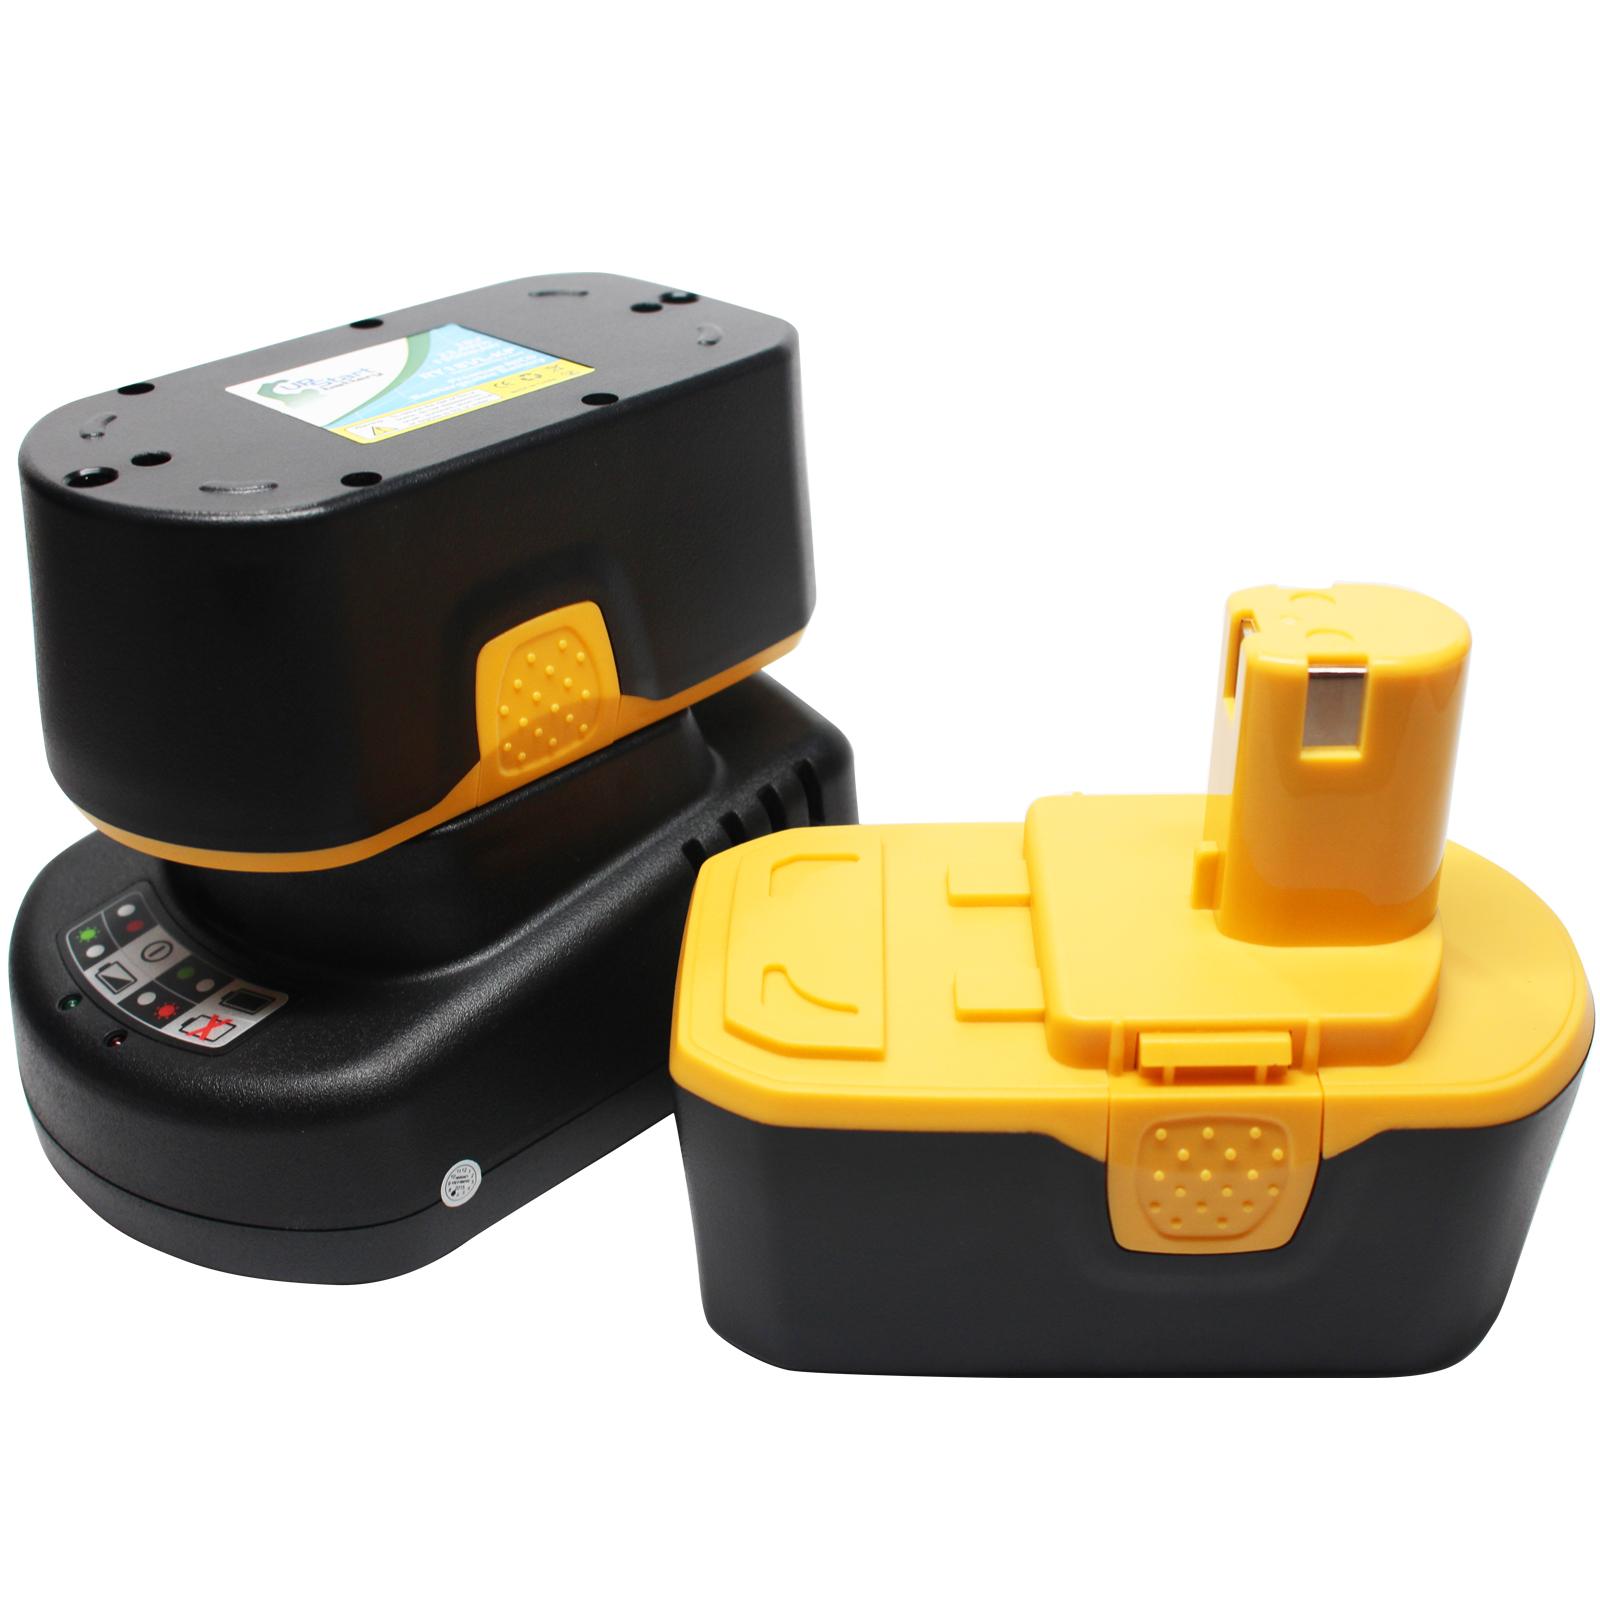 2-Pack - Ryobi P510 Battery + Universal Charger for Ryobi Replacement - For Ryobi 18V Power Tool Battery and Charger (1300mAh, NICD) - image 4 de 4